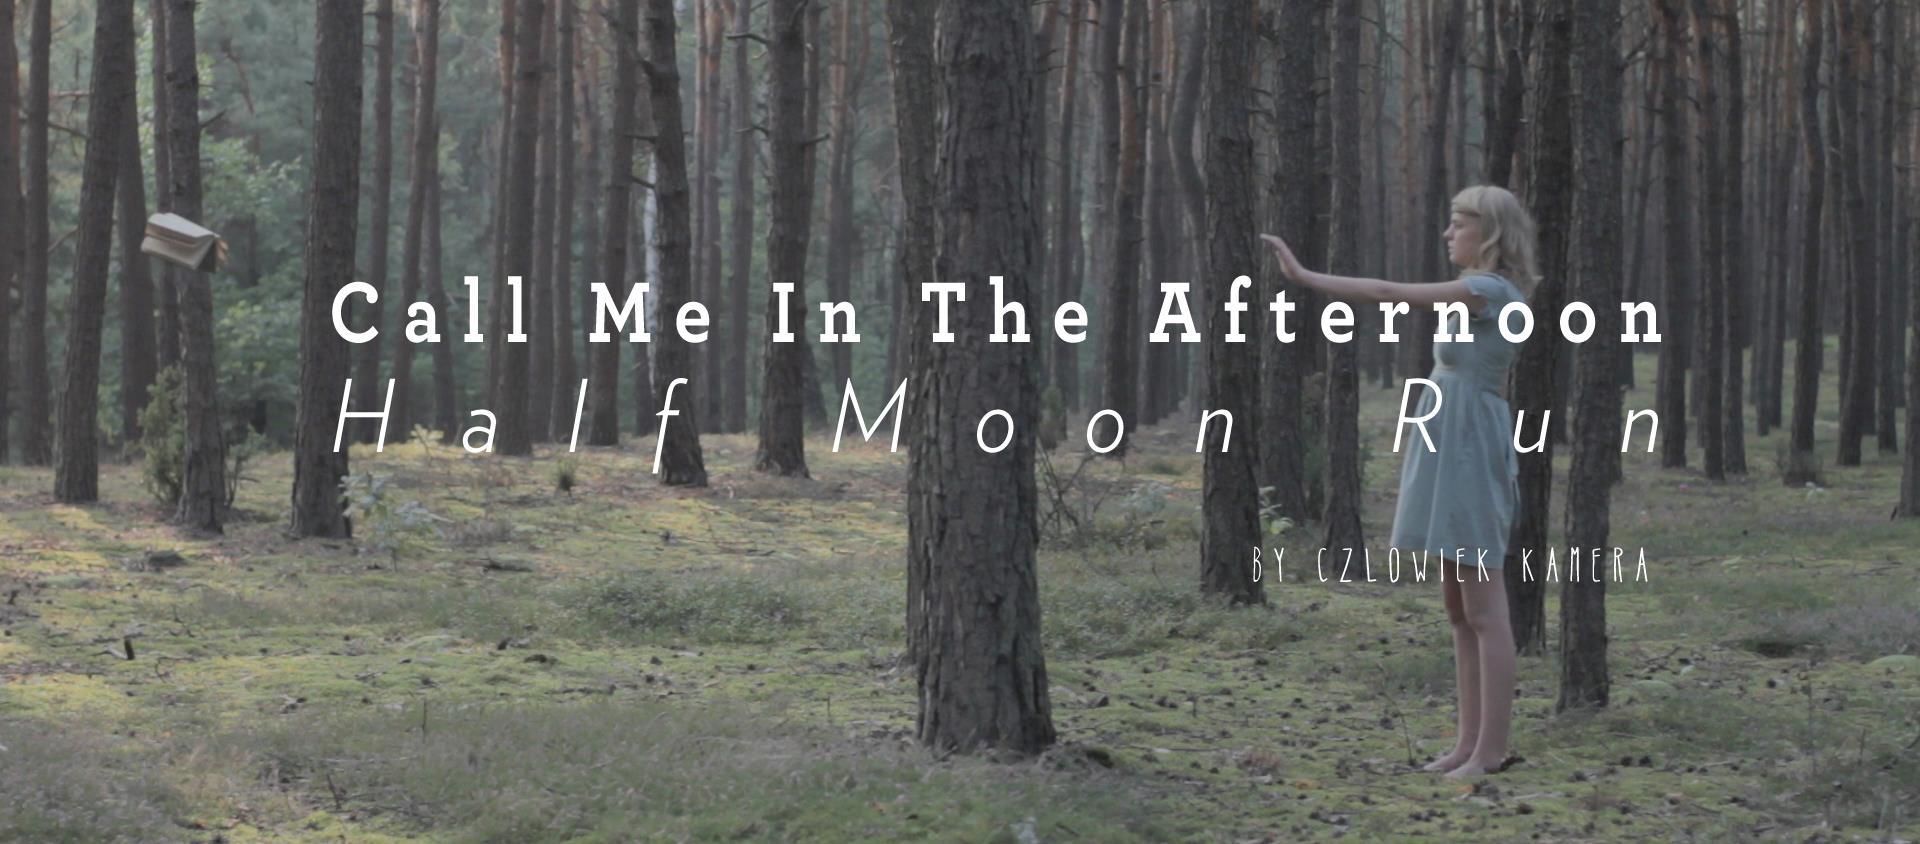 Half Moon Run - Call Me in the Afternoon. Vídeo por  Czlowiek Kamera.